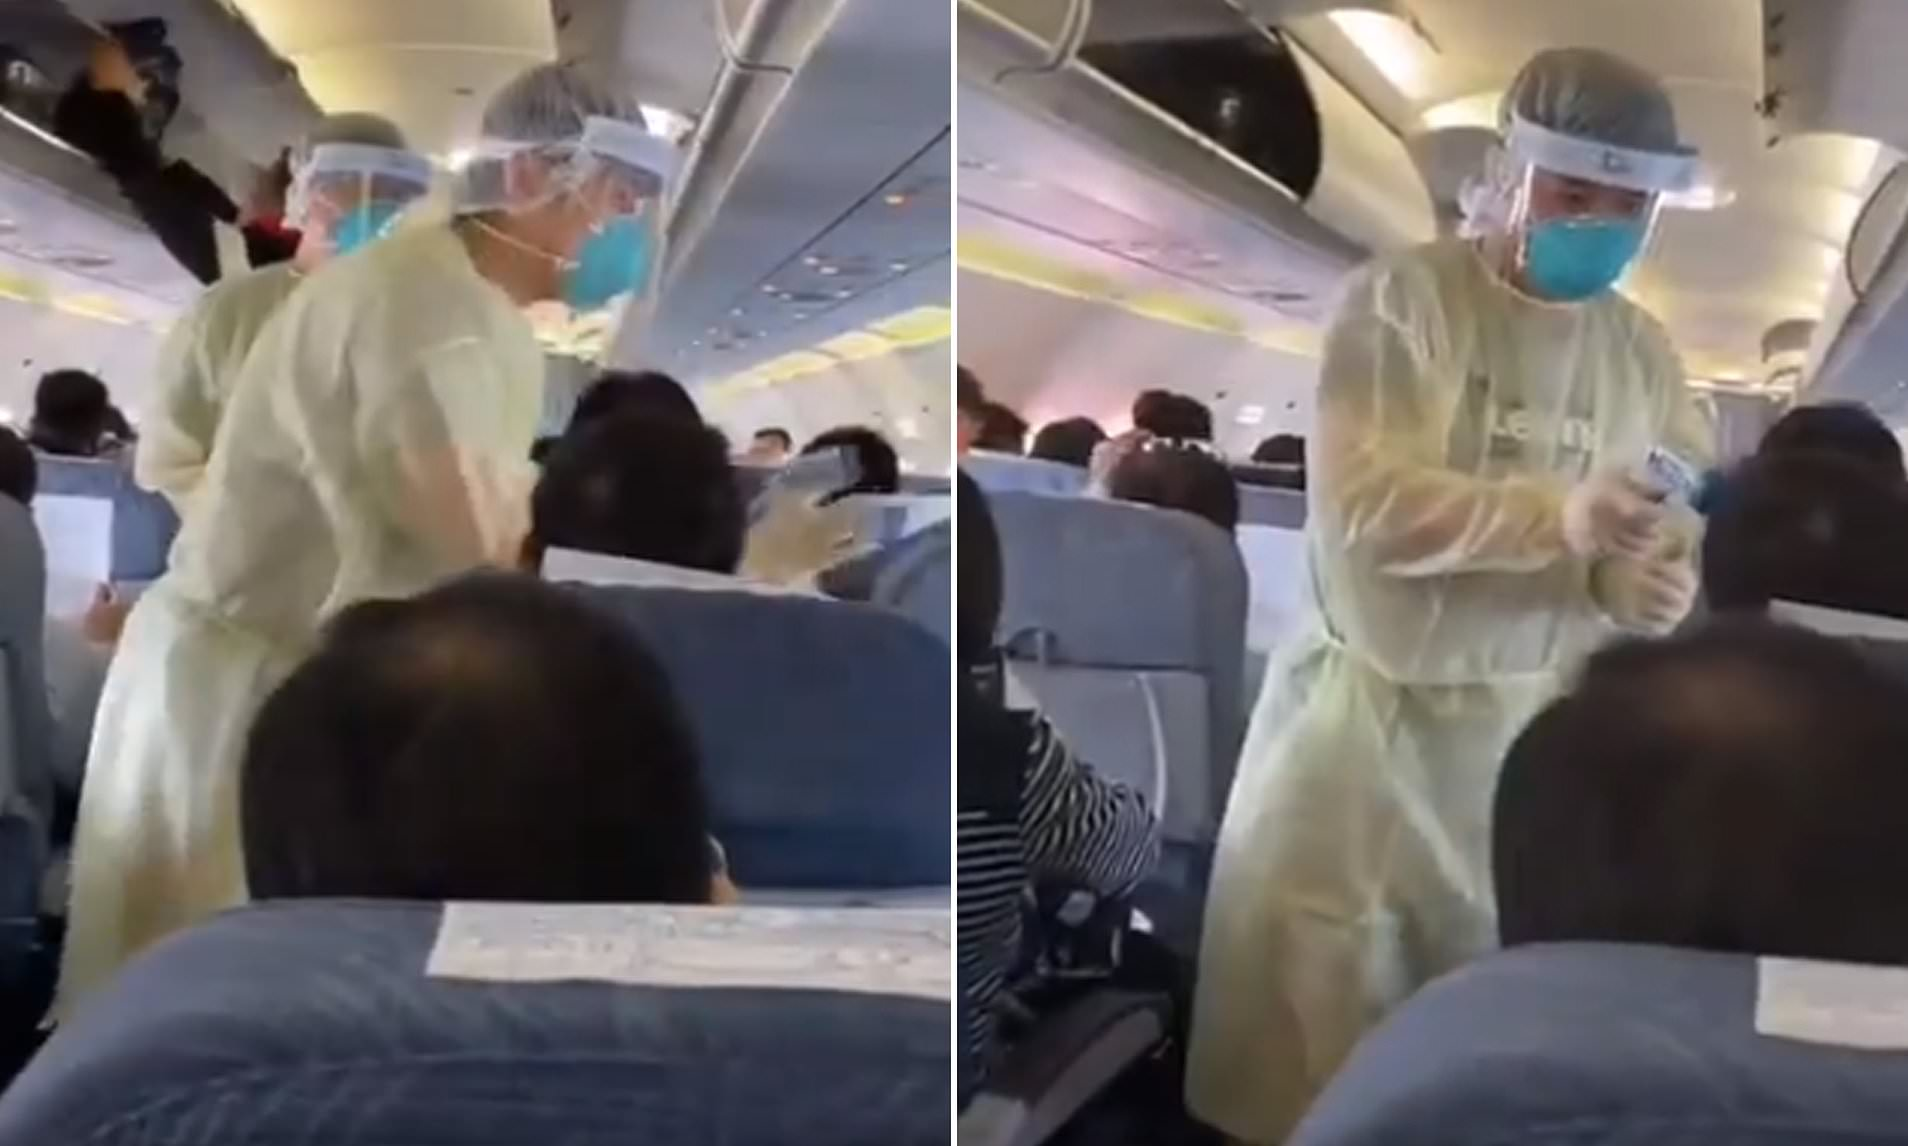 Coronavirus: Medics in hazmat suits scan Air China passengers ...